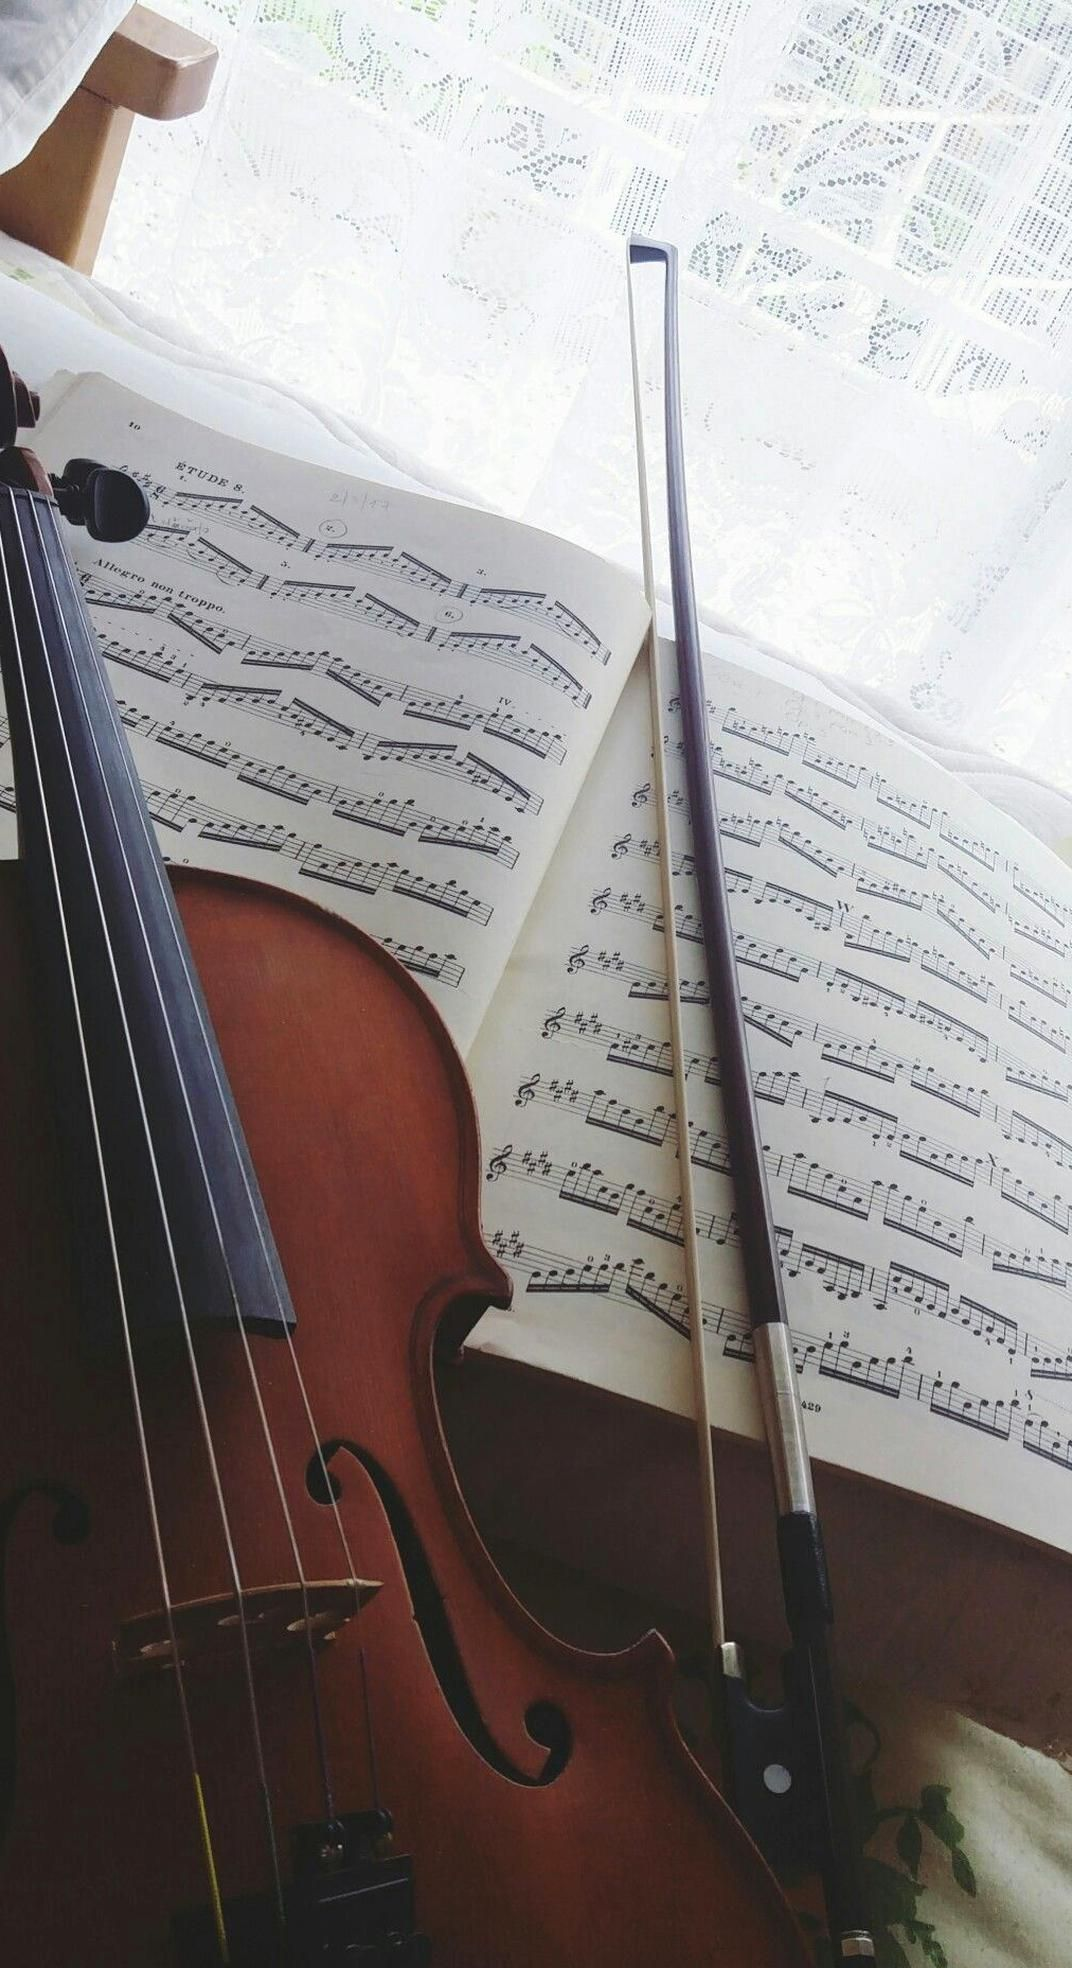 Documentaries Classical Music Aesthetic Violin Classical Music Aesthetic Violin Indian Classical Mus Classical Music Poster Classical Music Concerts Violin